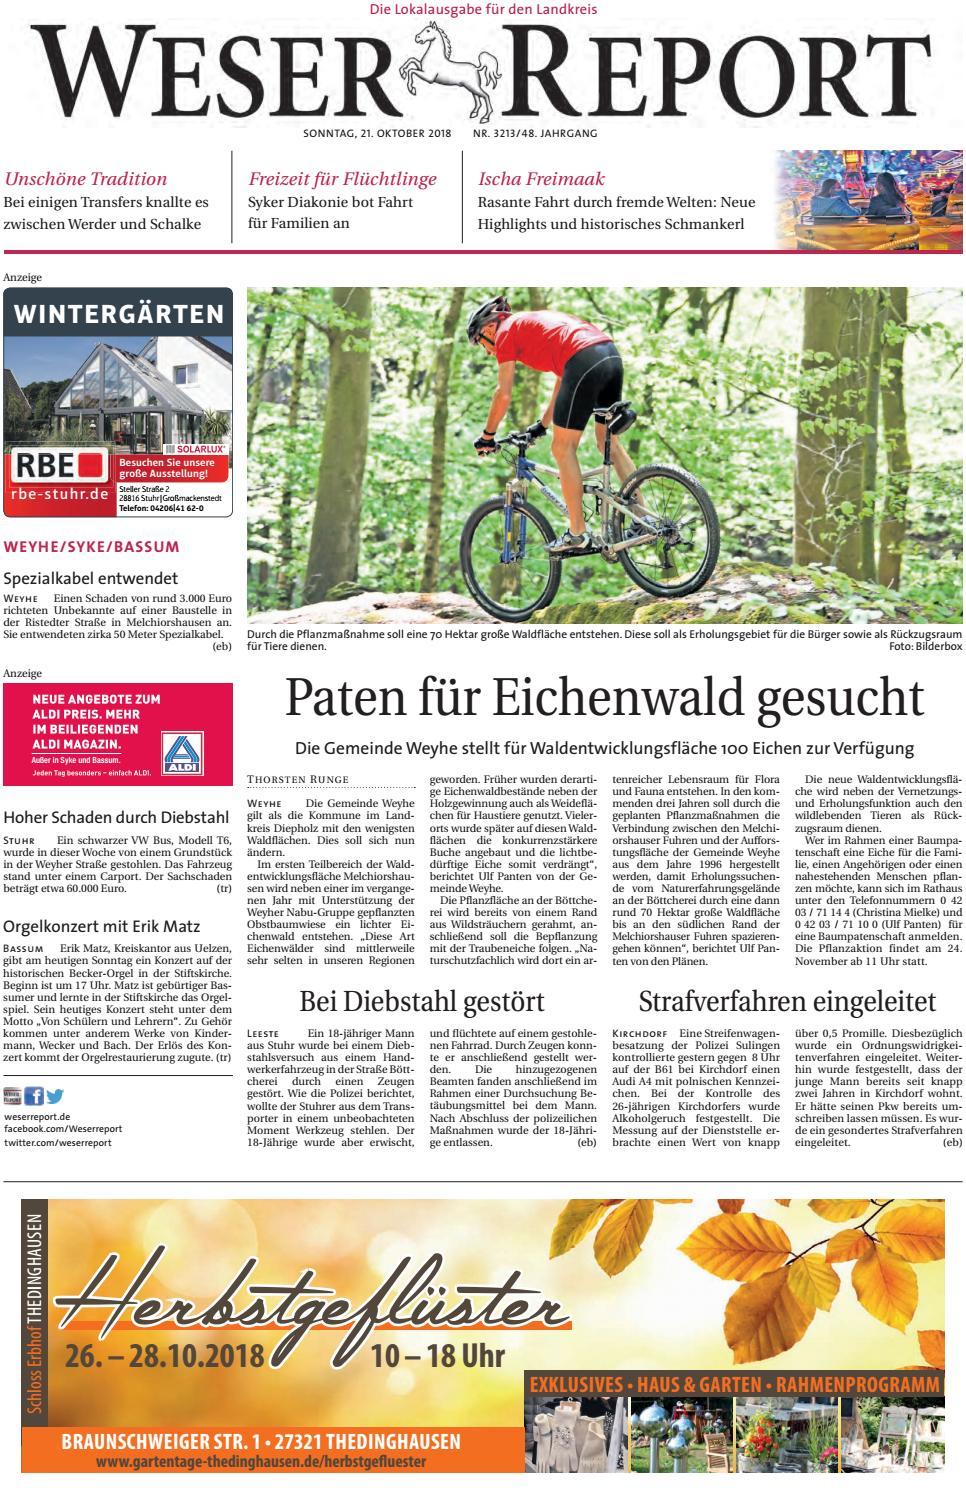 Weser Report - Weyhe, Syke, Bassum vom 21.10.2018 by KPS ...